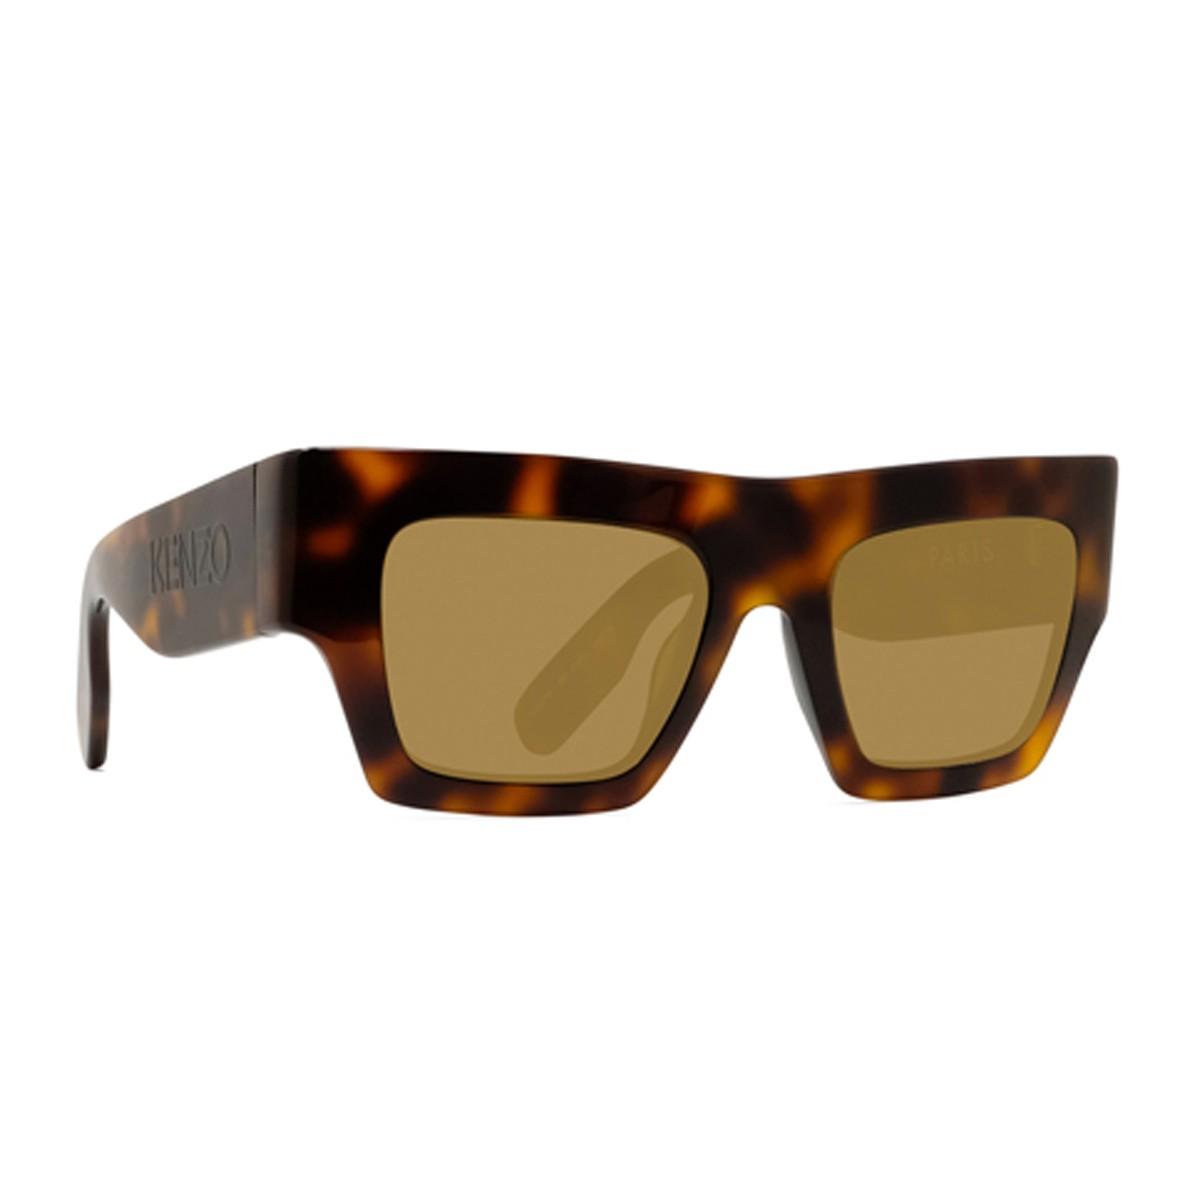 Kenzo KZ40070I   Unisex sunglasses